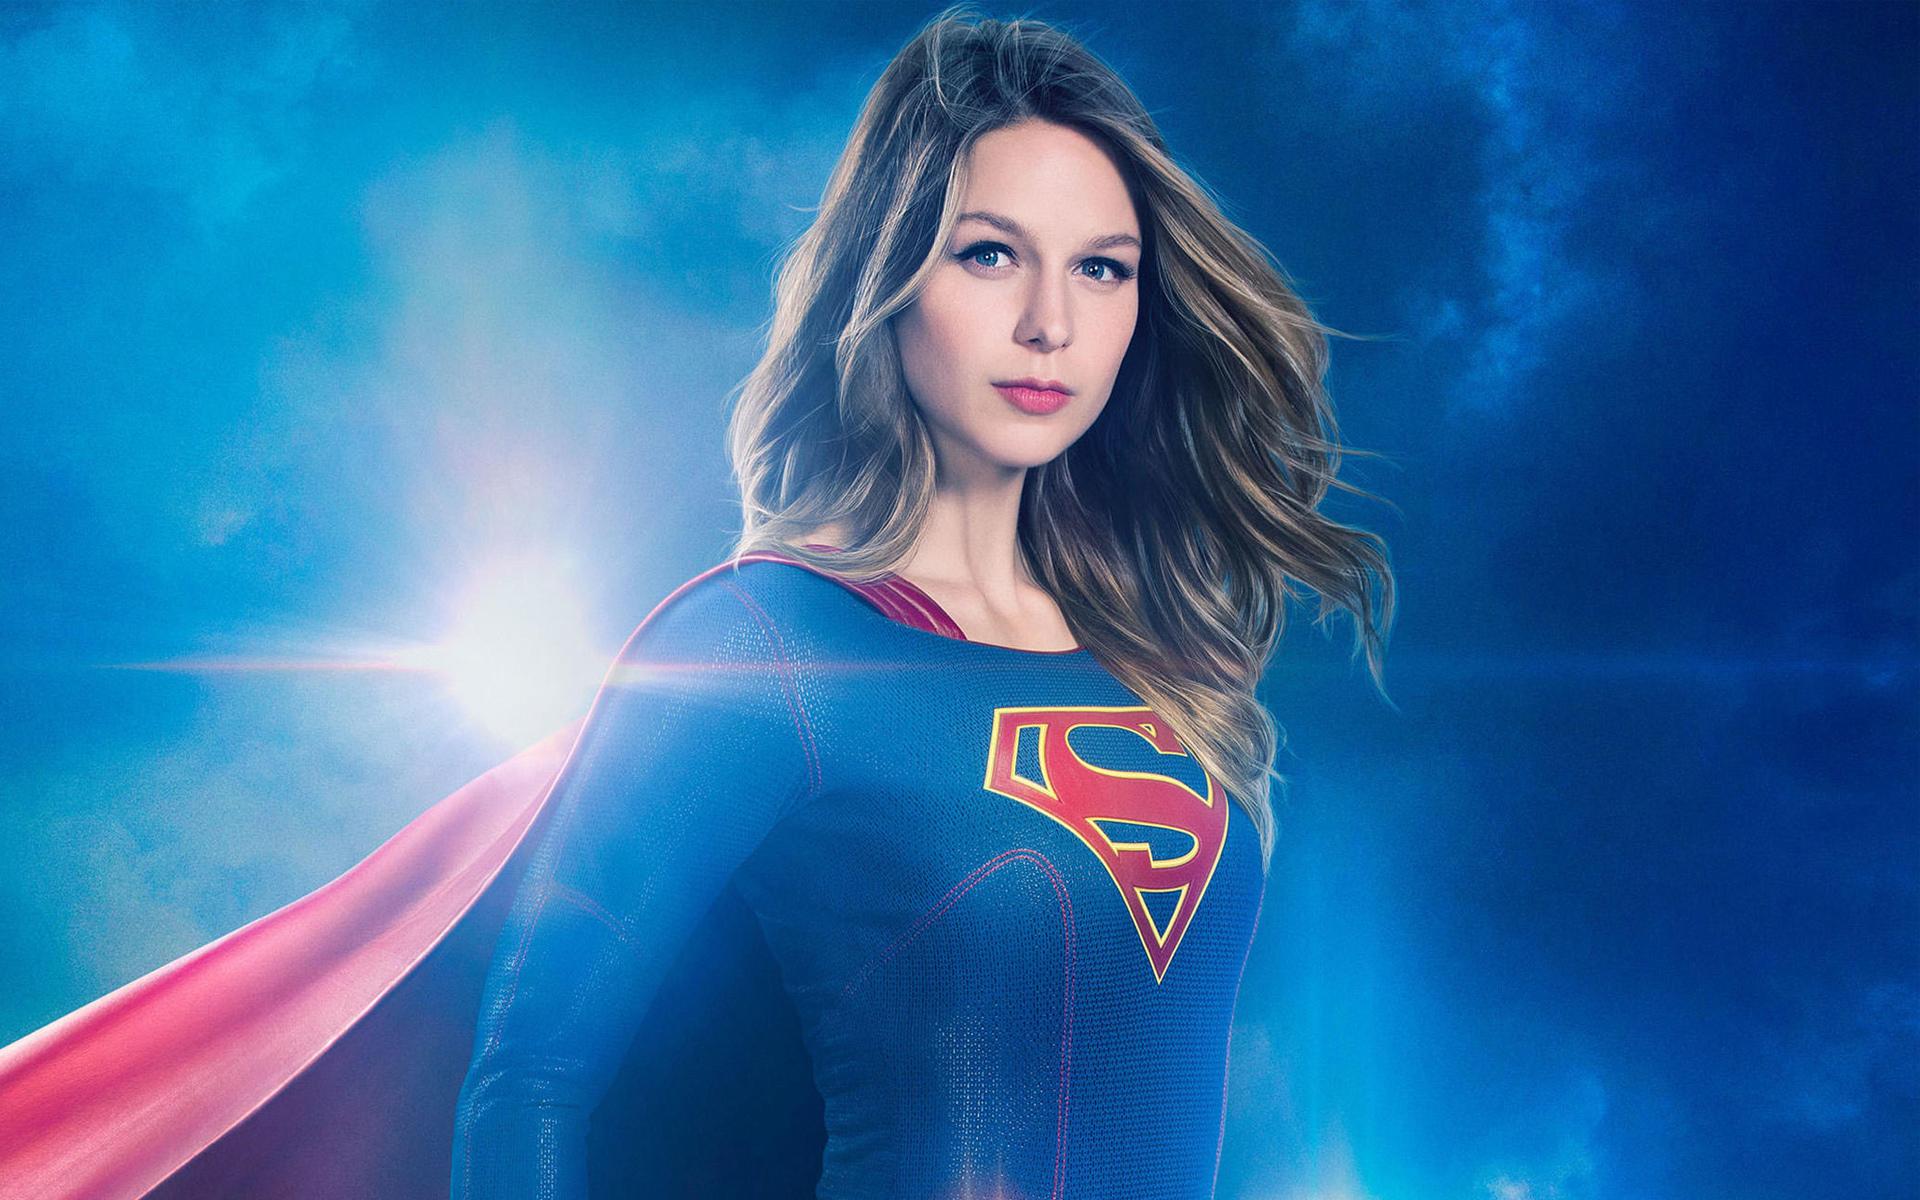 Fondos Serie Supergirl, Wallpapers Gratis